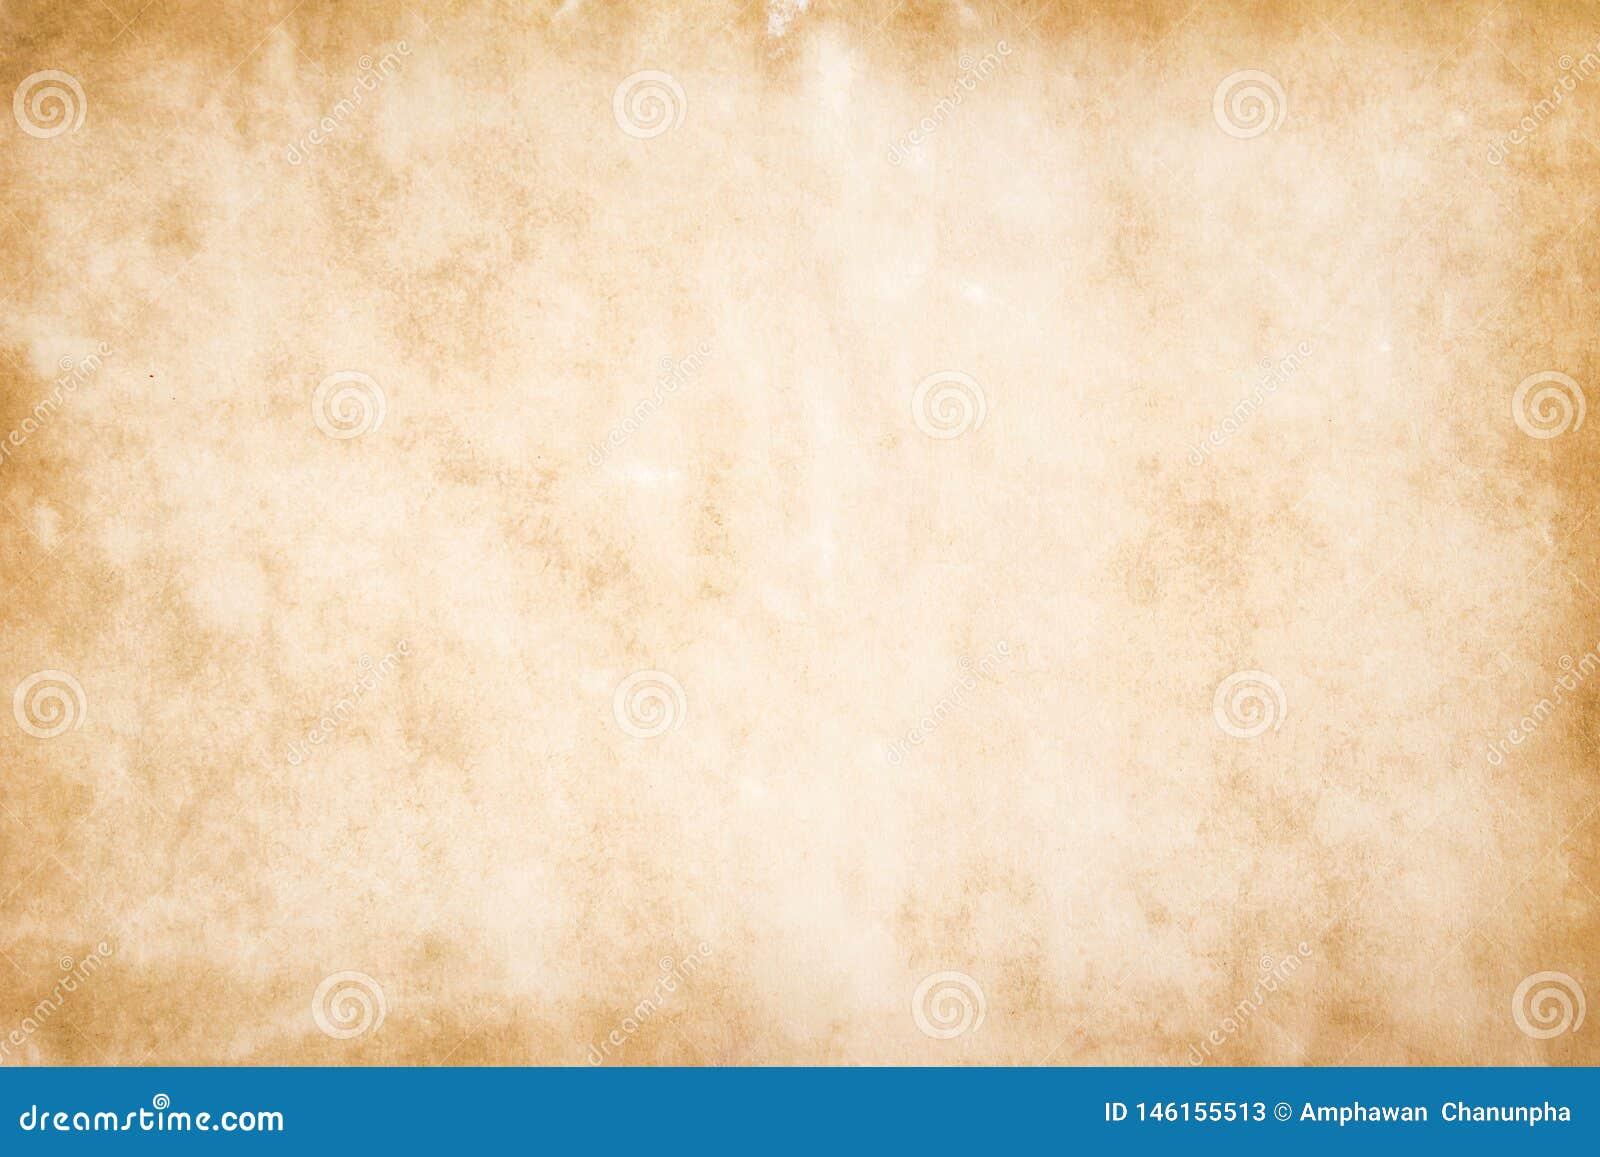 Vintage Grunge Paper Patterns Texture , Old Blank Light ...